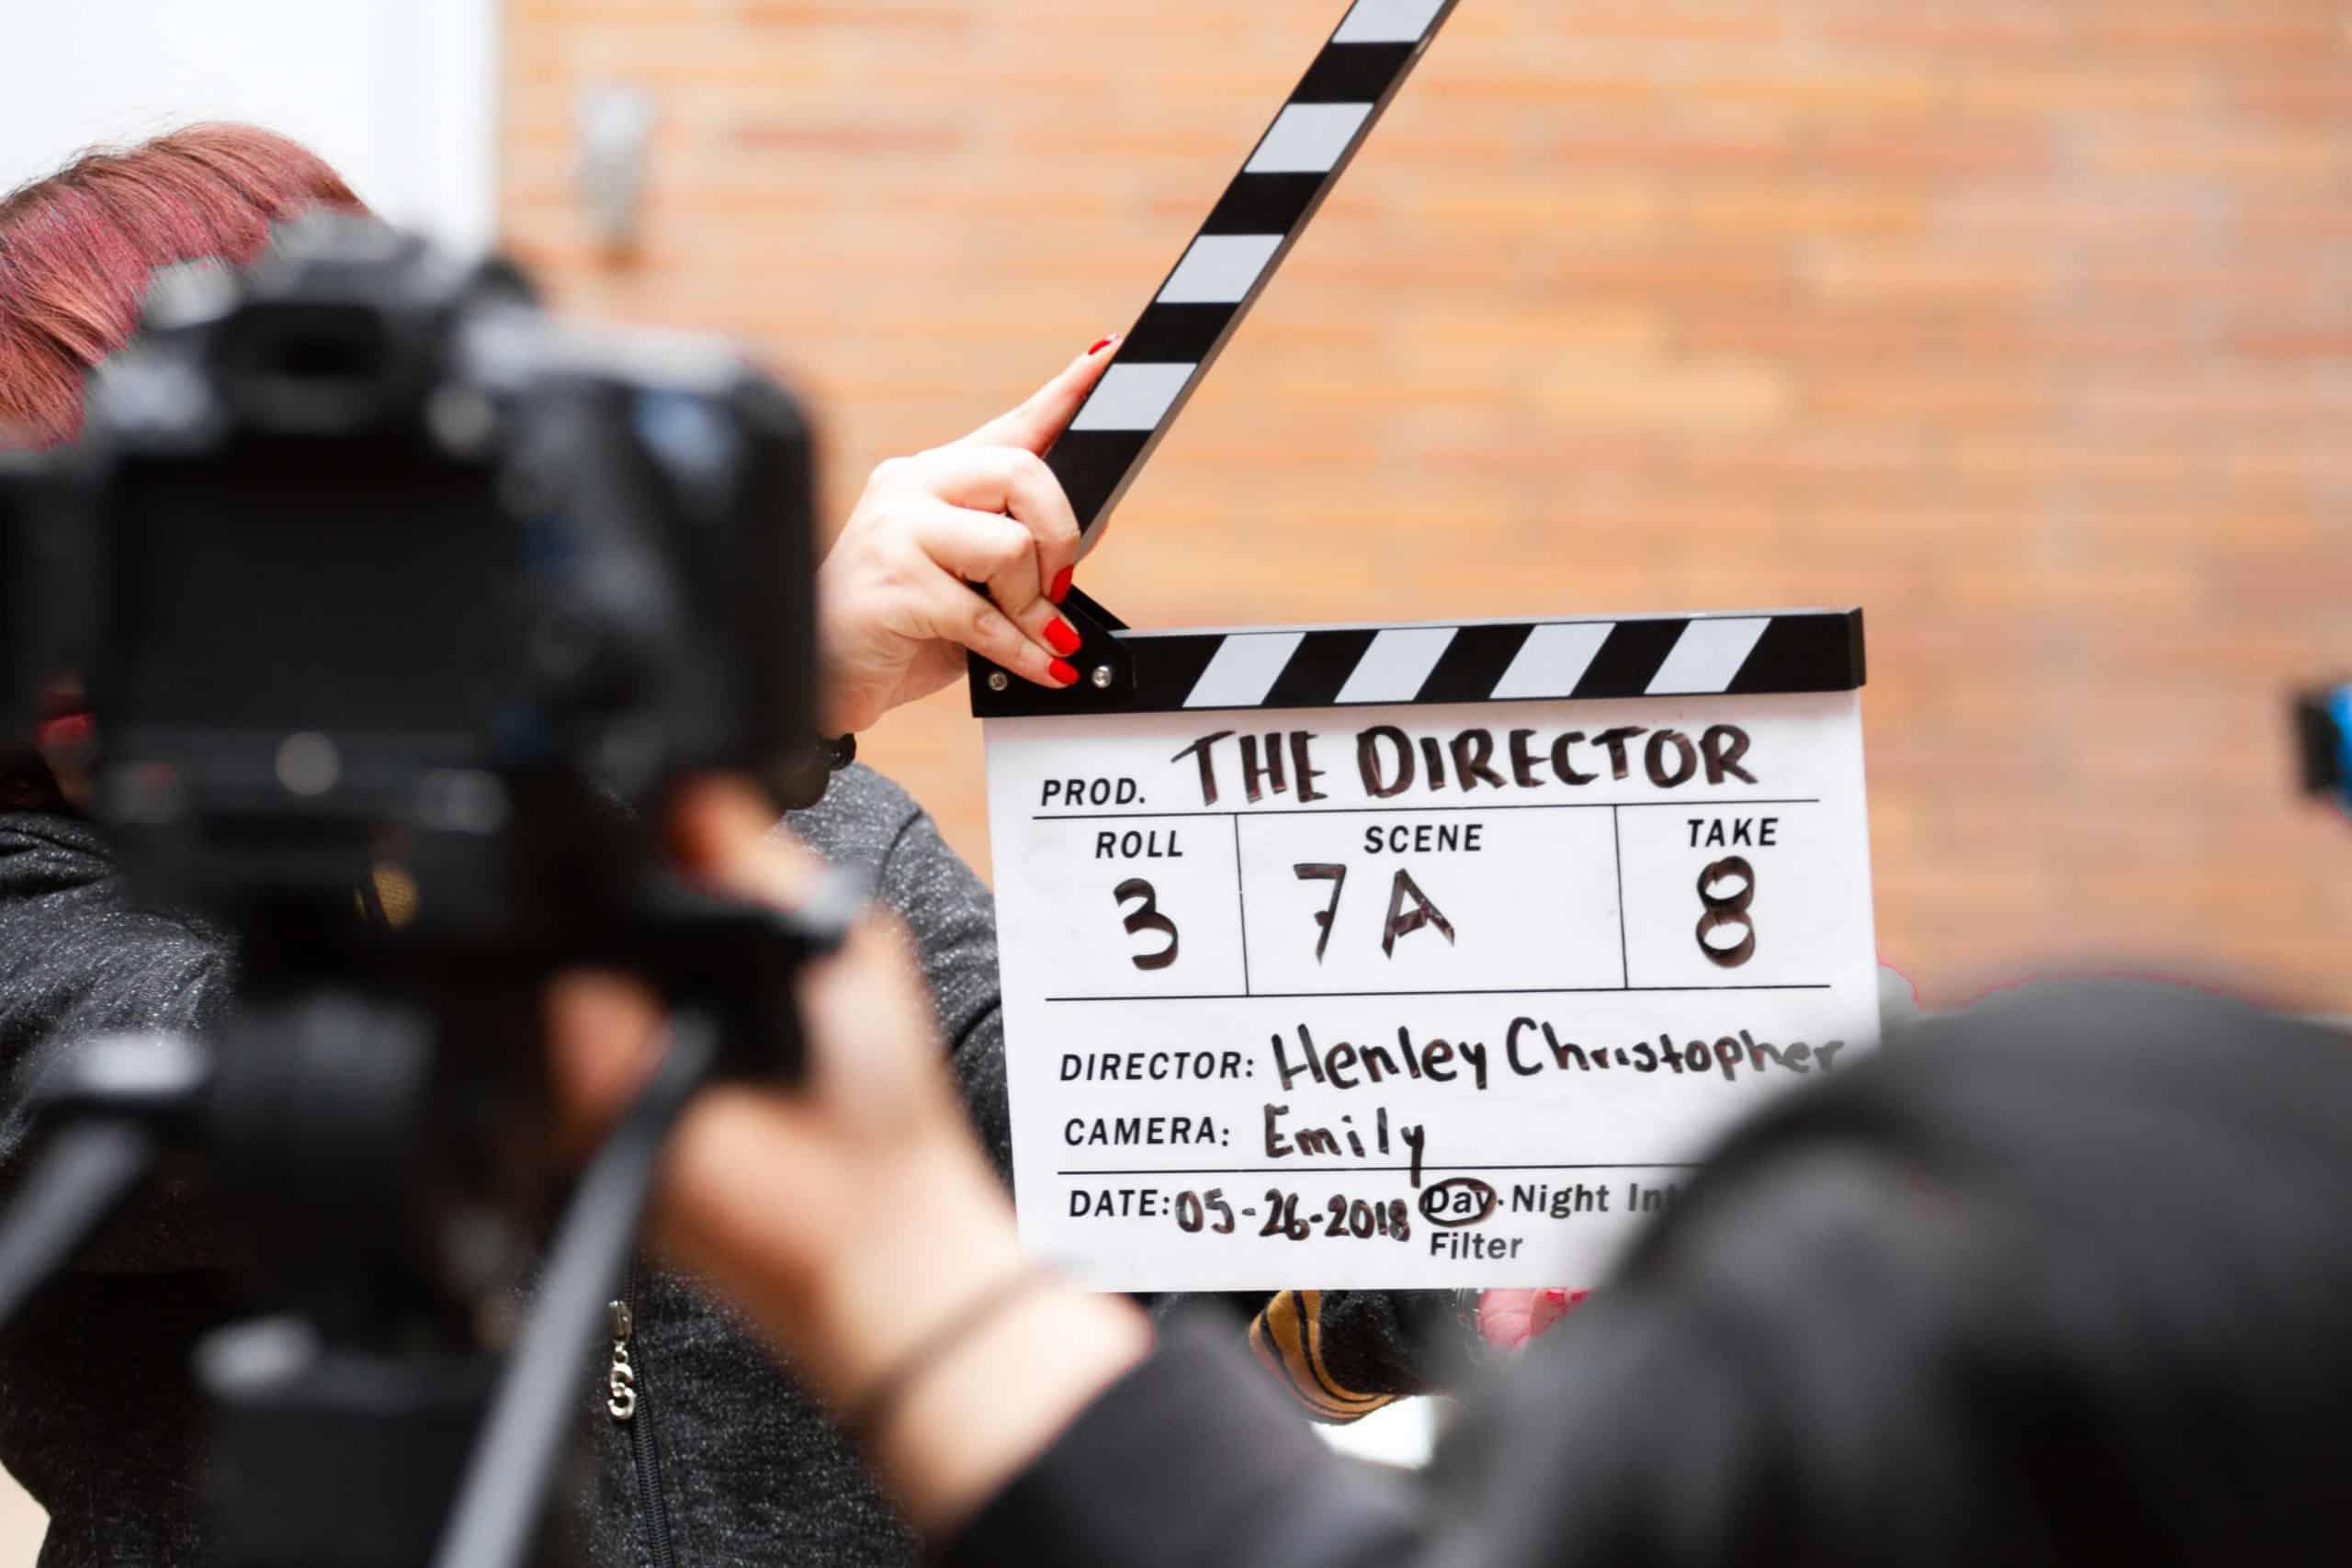 Marketing Offer Movie Magic Marketing Report Business Bitesize Prospero Accounting